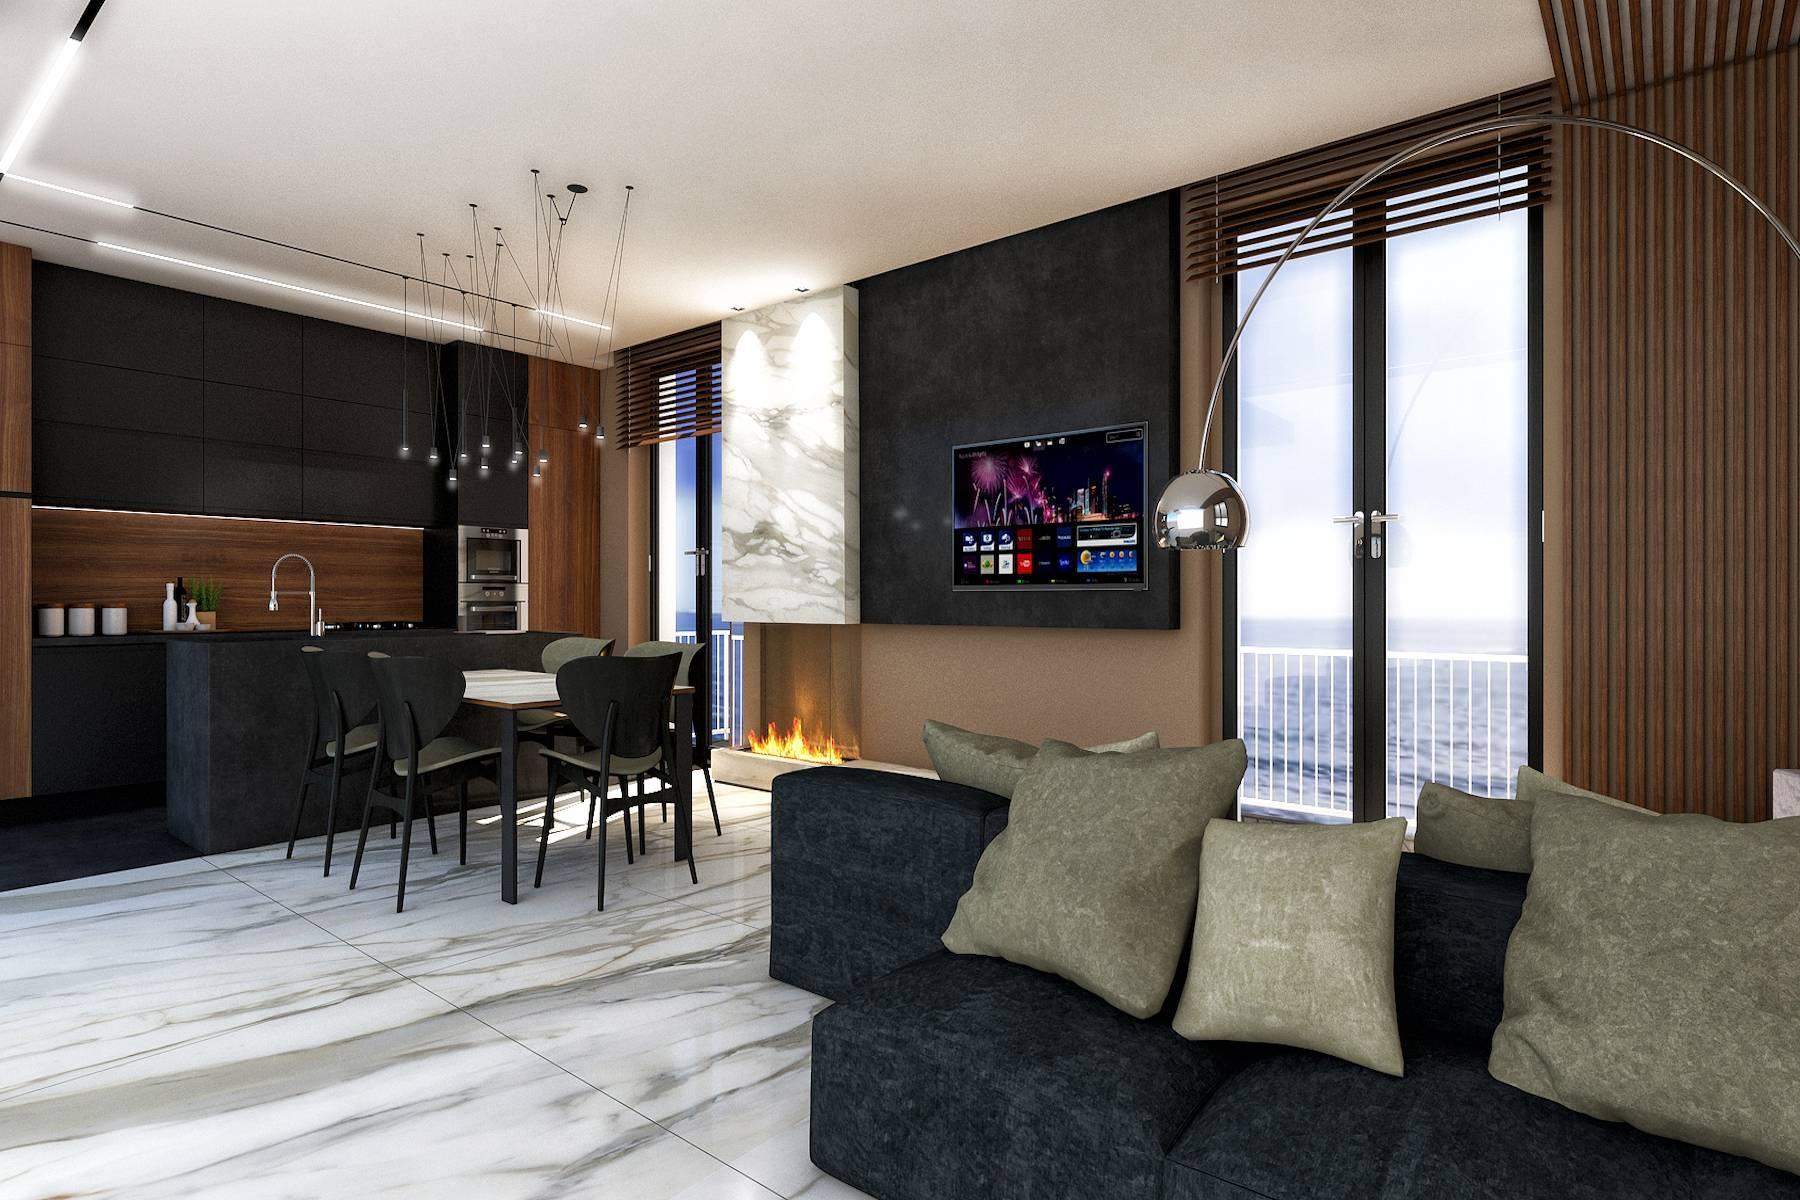 Luxury seafront penthouse in Viareggio - 6